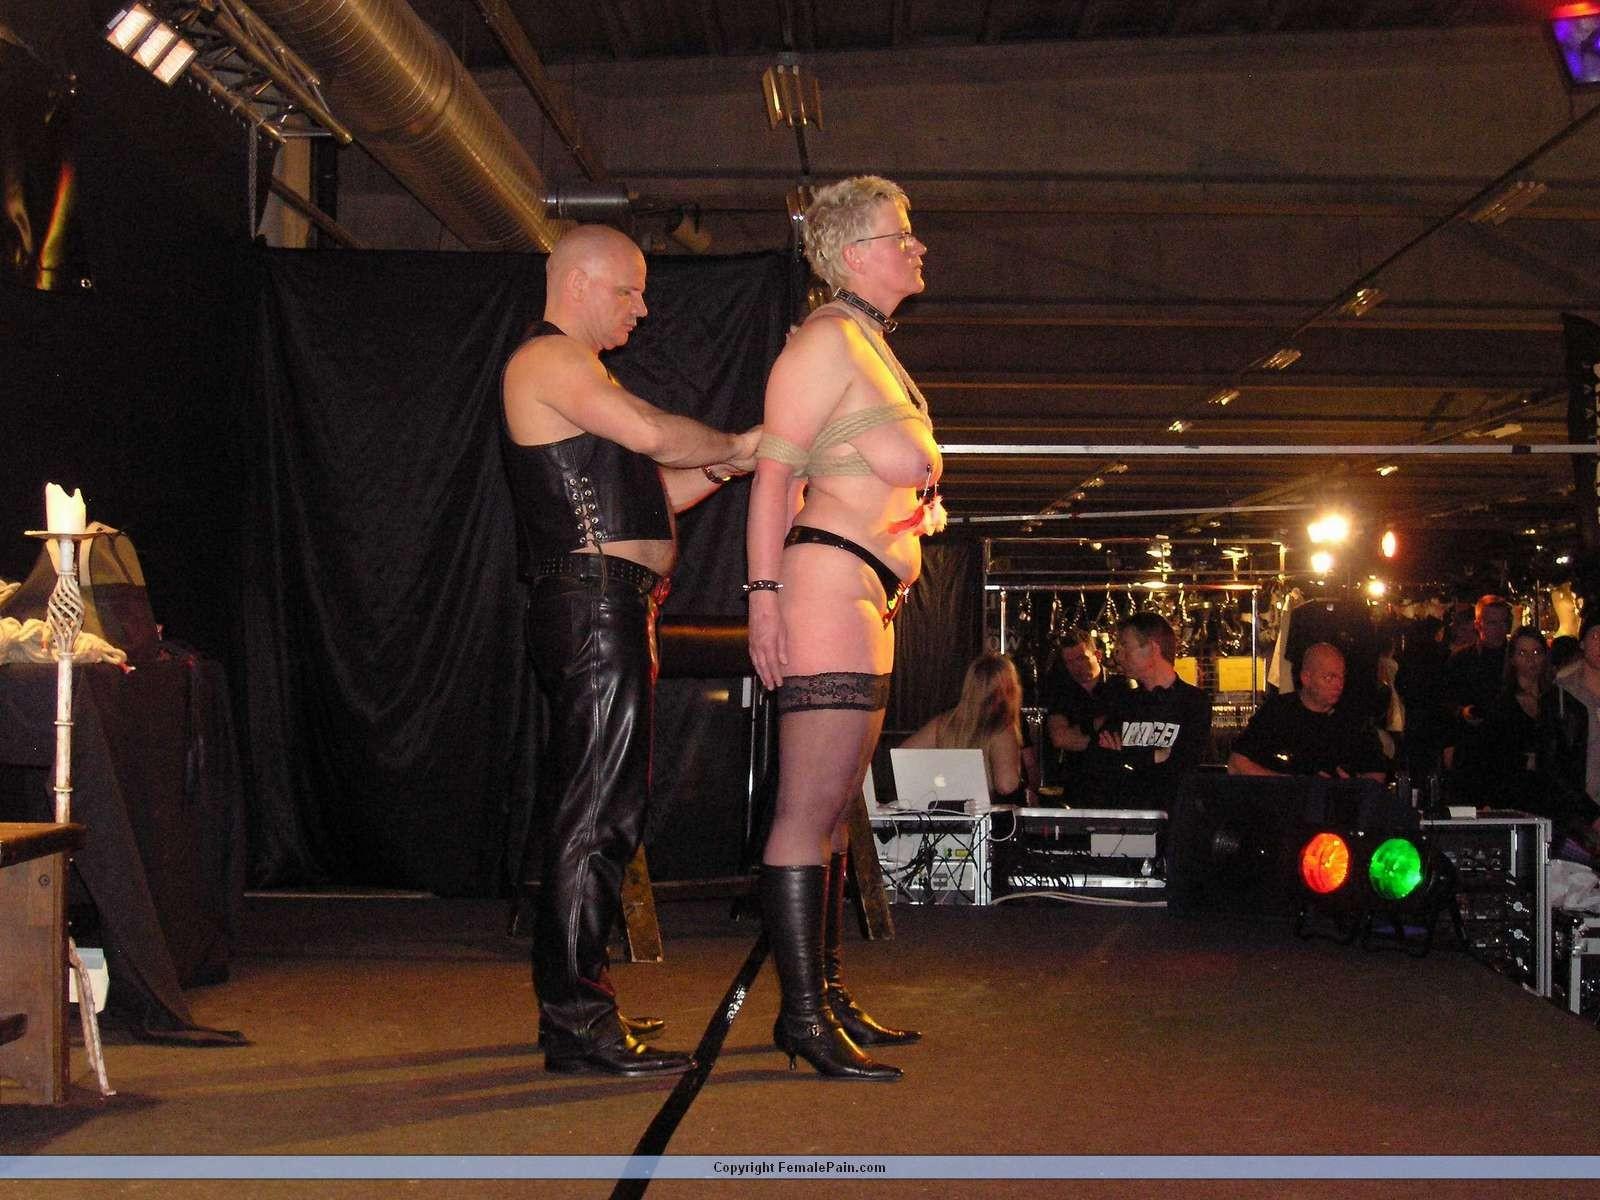 blonde amateur slavegirls public bdsm and kinky fetish